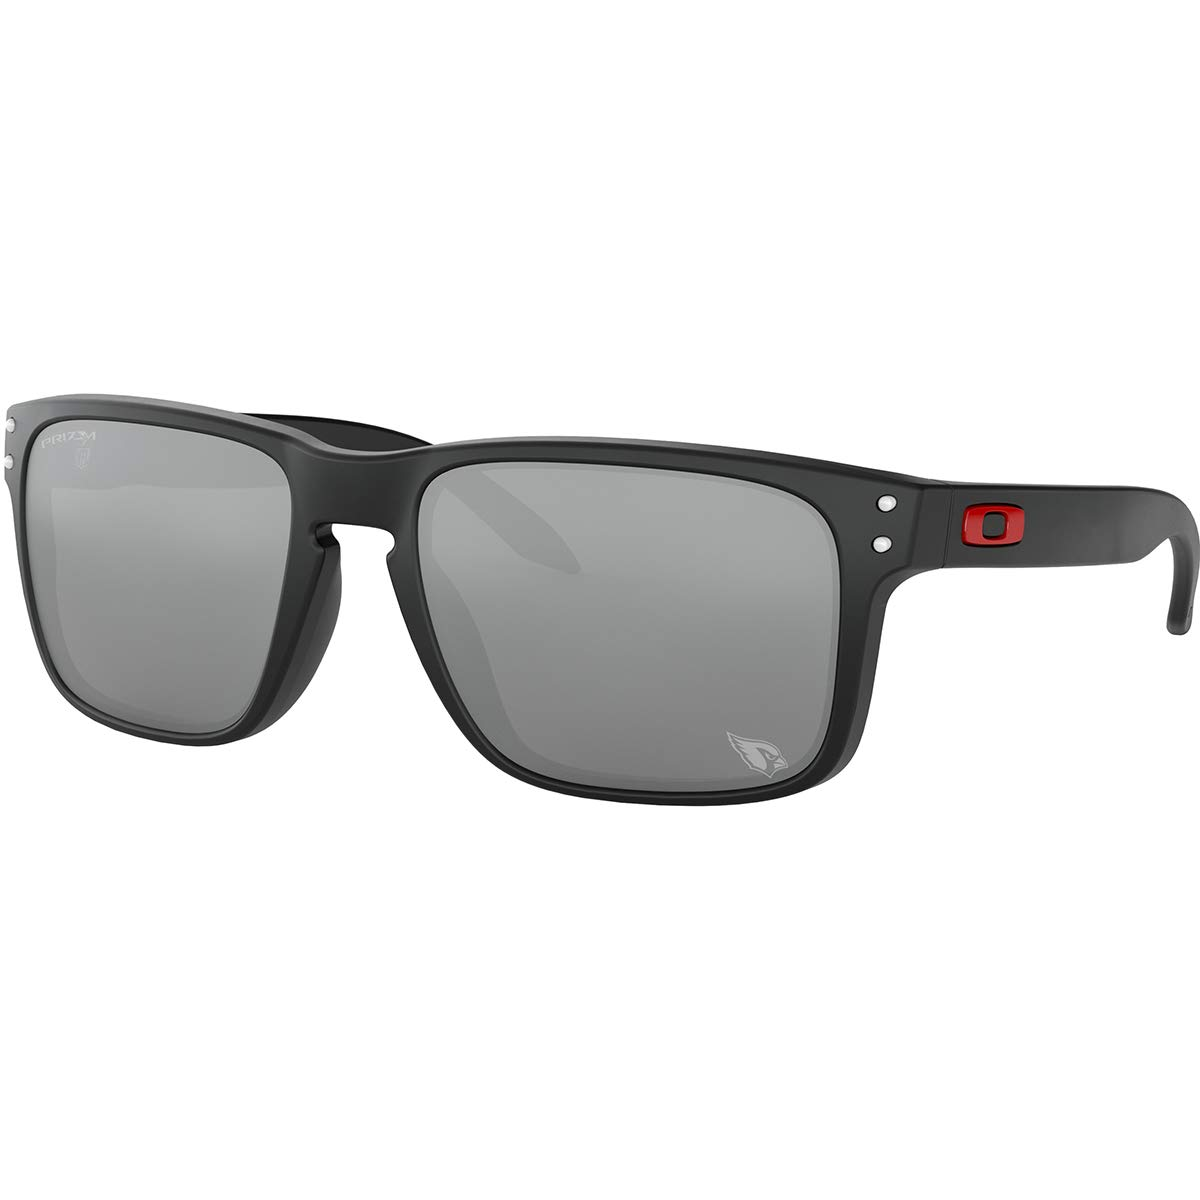 Amazon.com: Oakley NFL Holbrook Square - Gafas de sol para ...